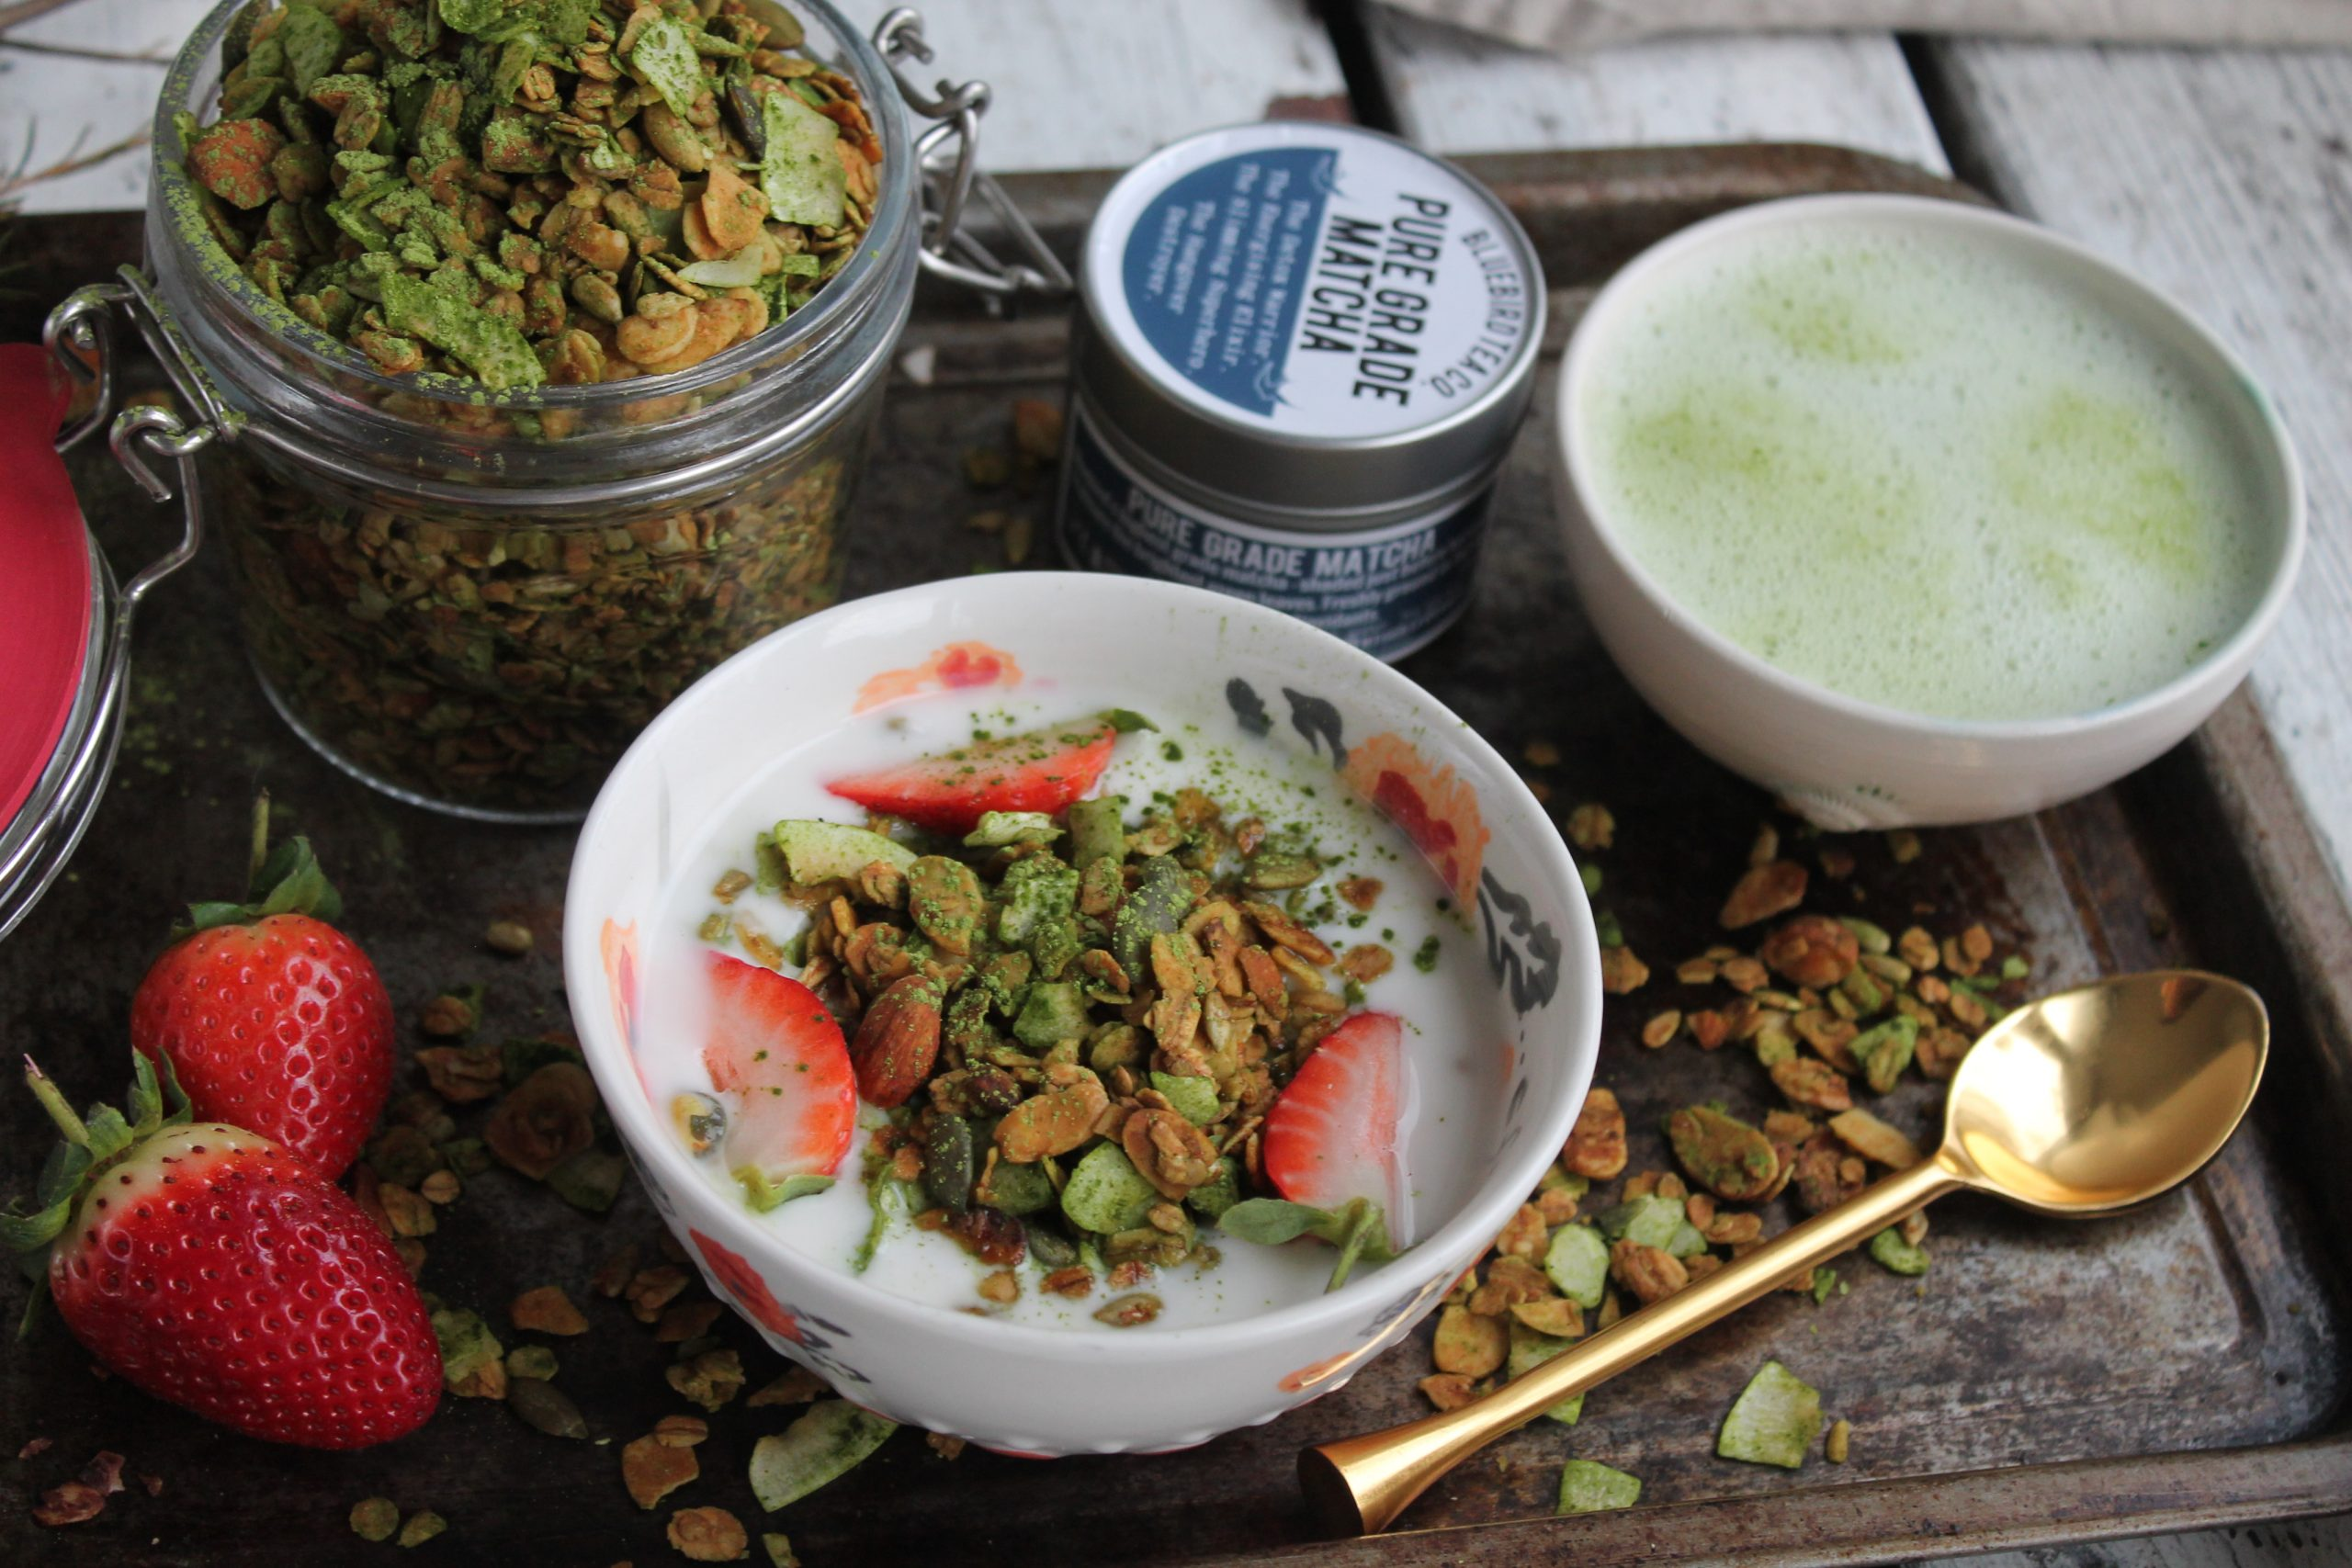 Matcha Green Tea Granola